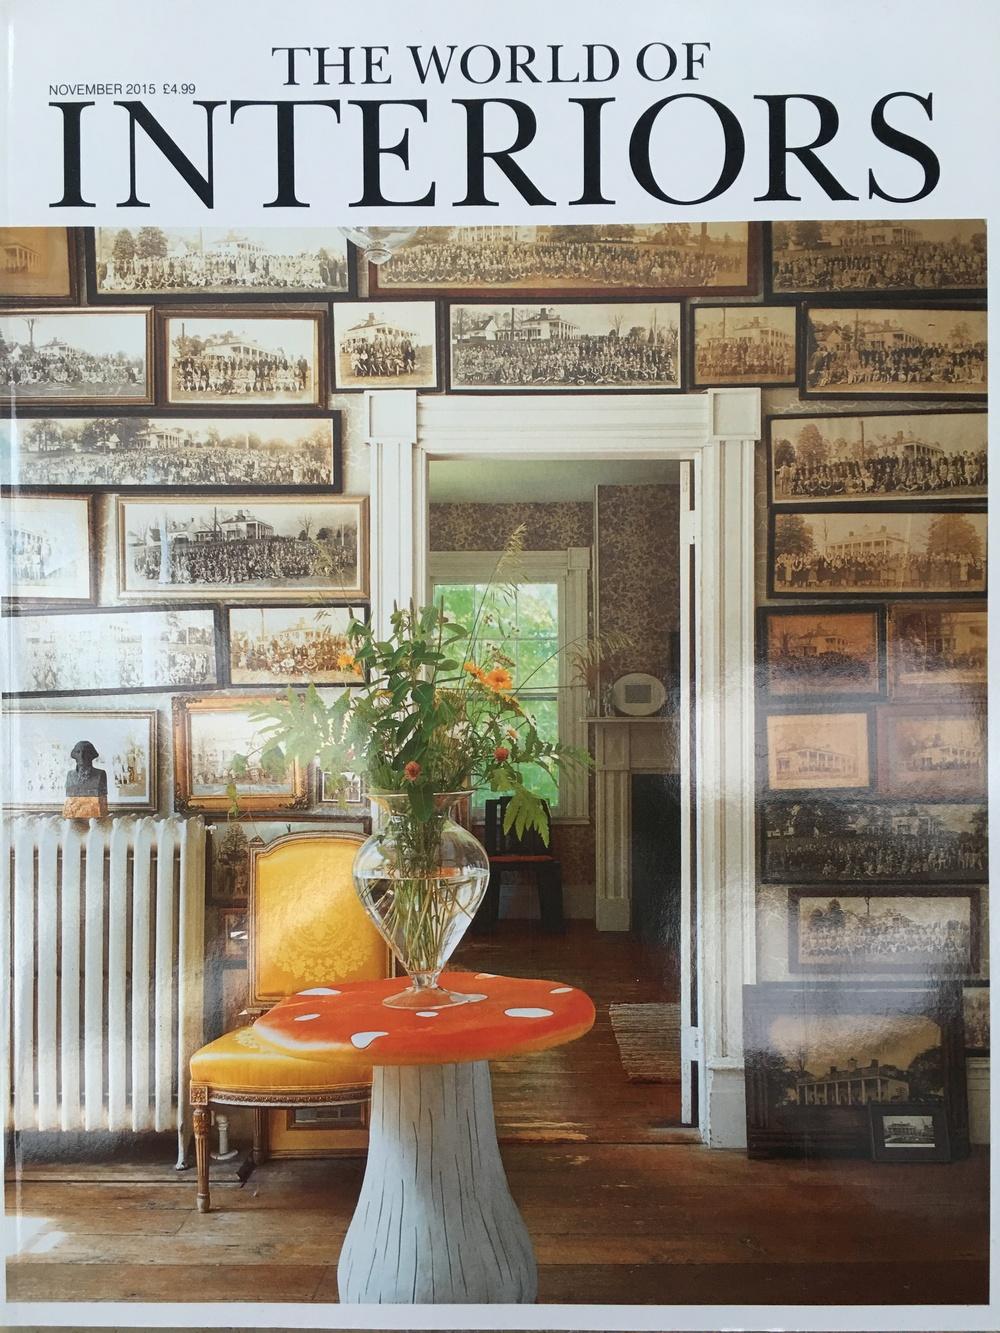 The World of Interiors November 2015